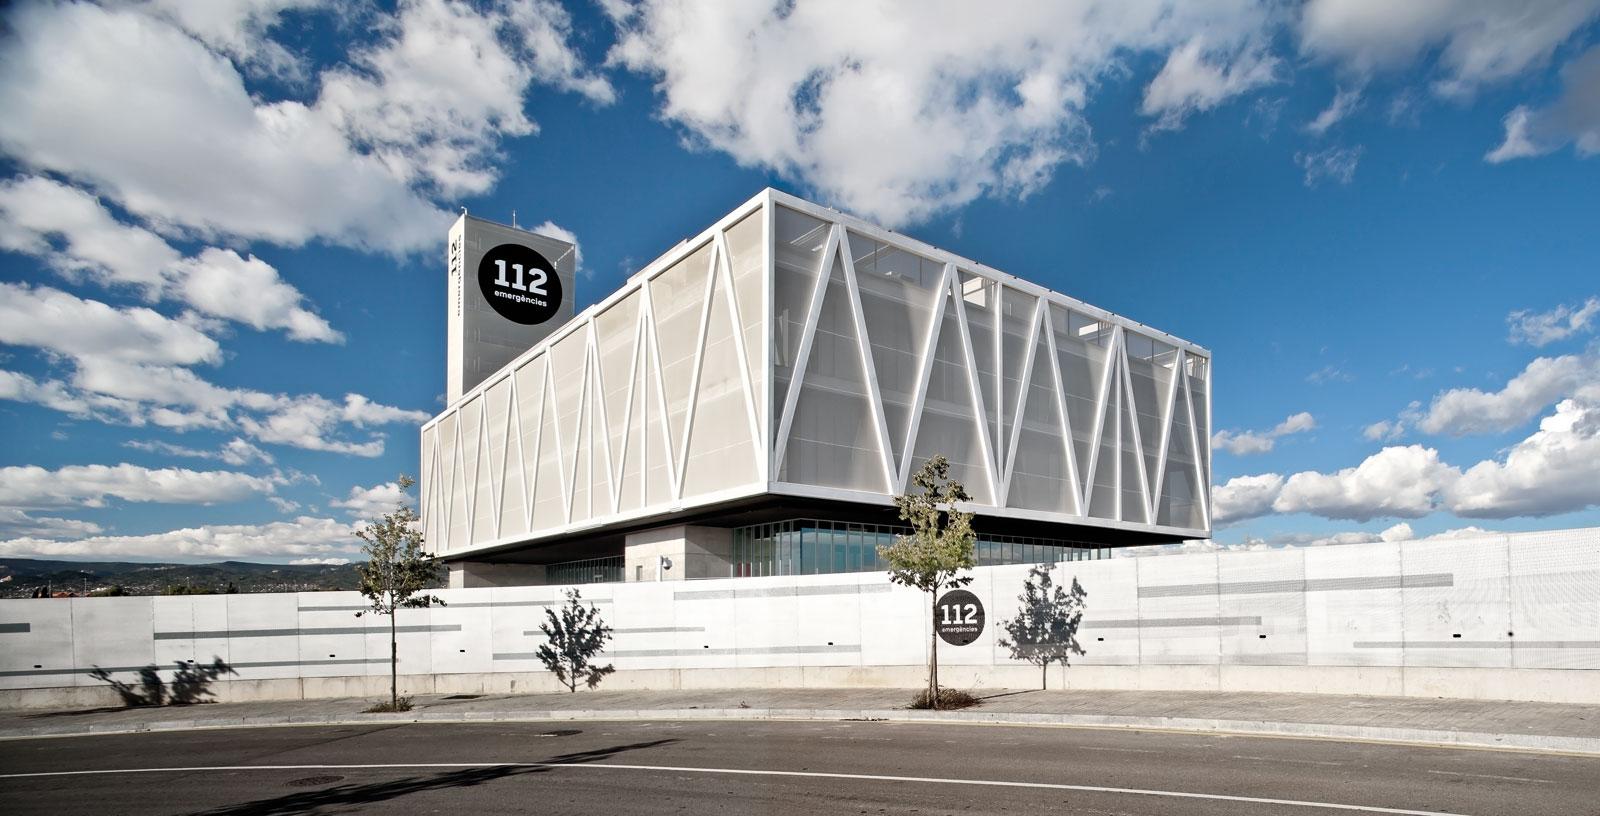 112-emergencies-building_01_Architecture_Idom_Photos_Adria_Goula-2